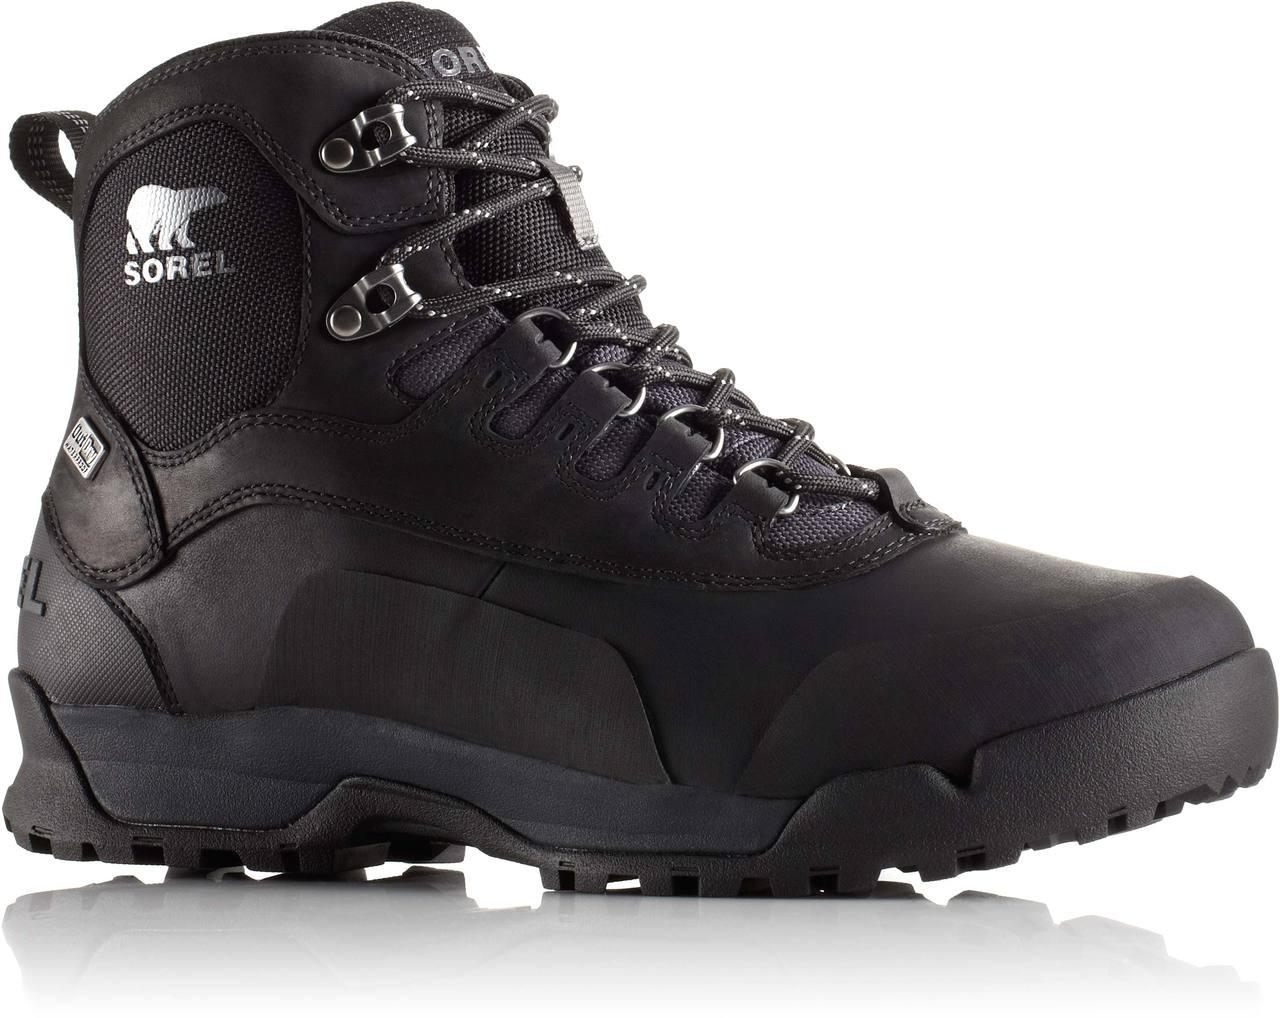 ... Ankle Boots; Sorel Men's Sorel Paxson OutDry. Black/Shark